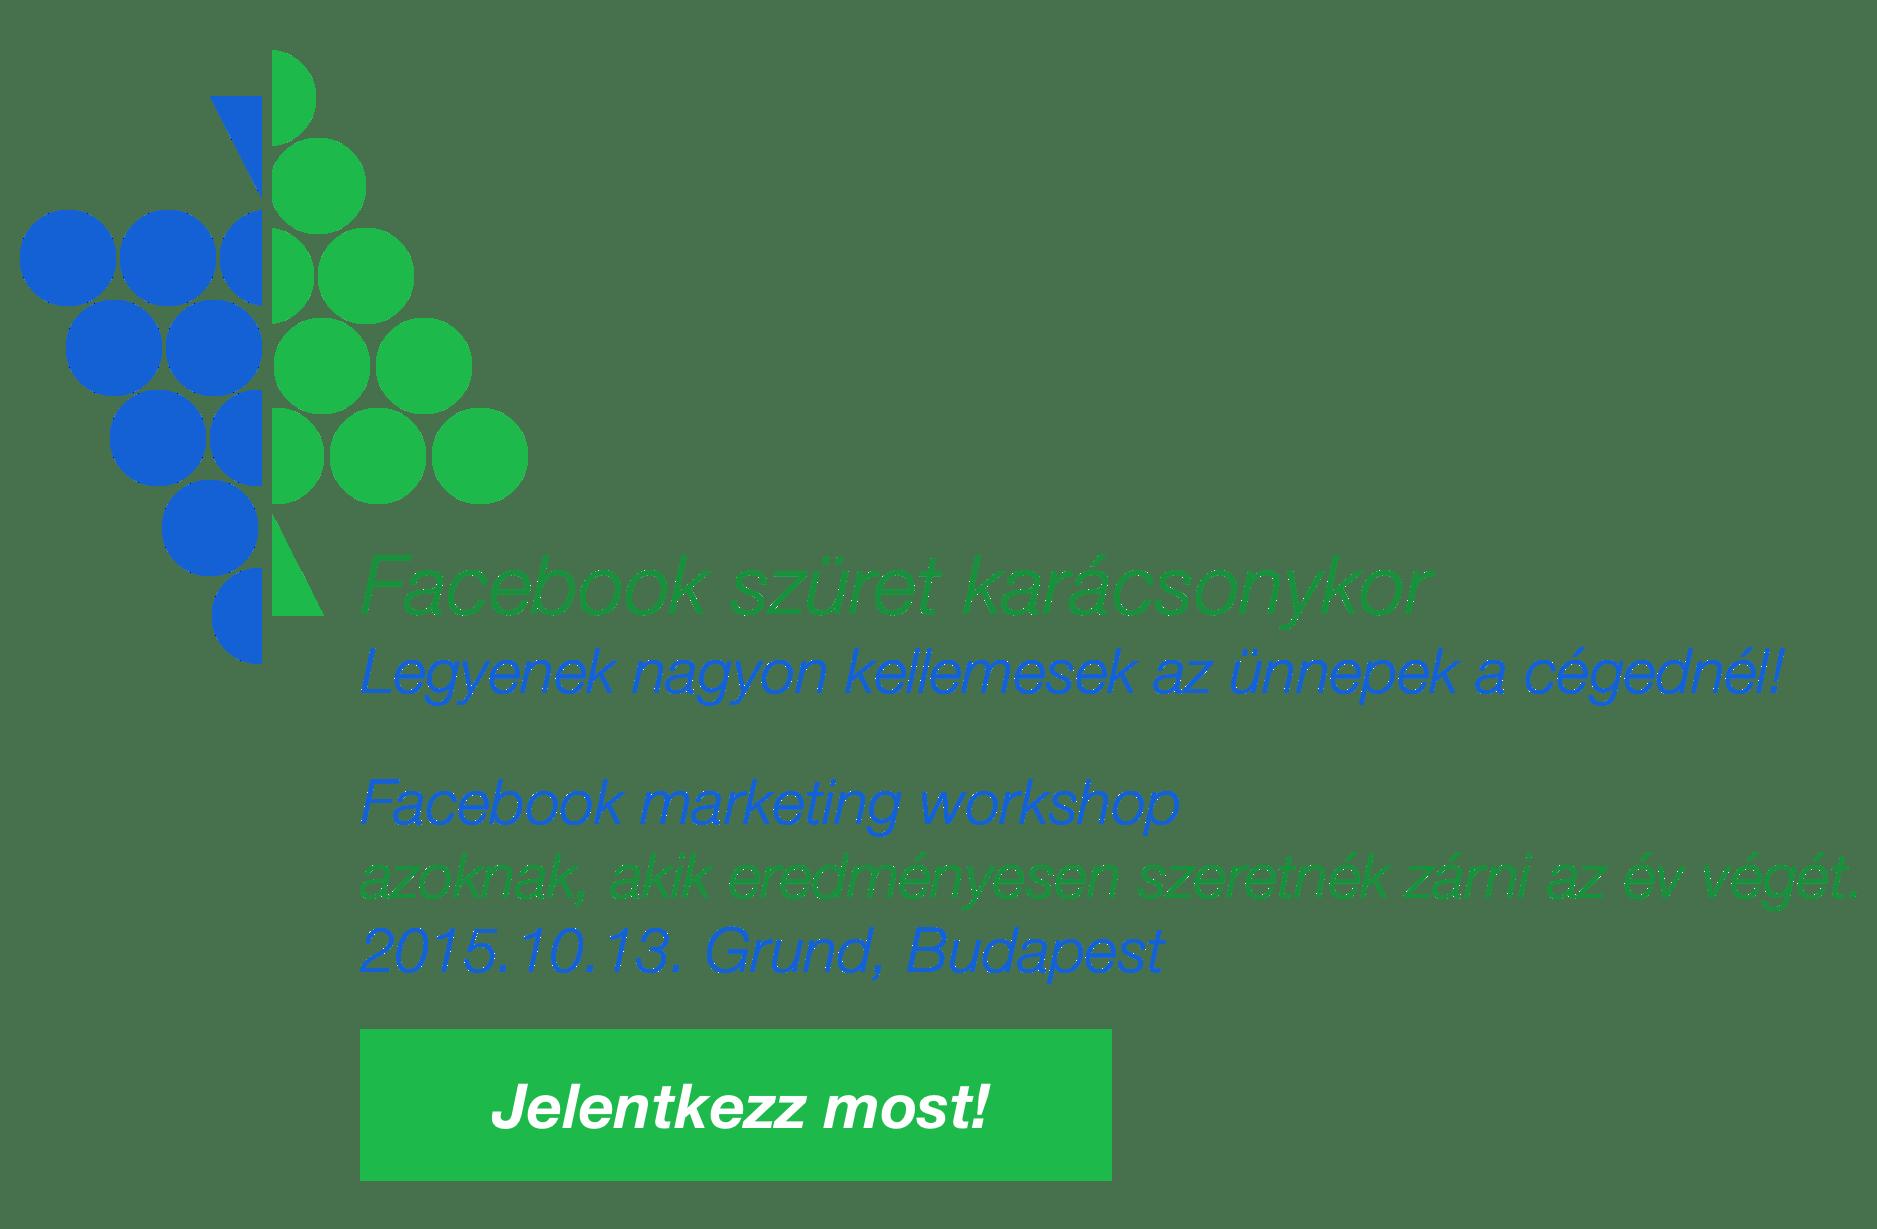 karacsony-ws-belso-banner